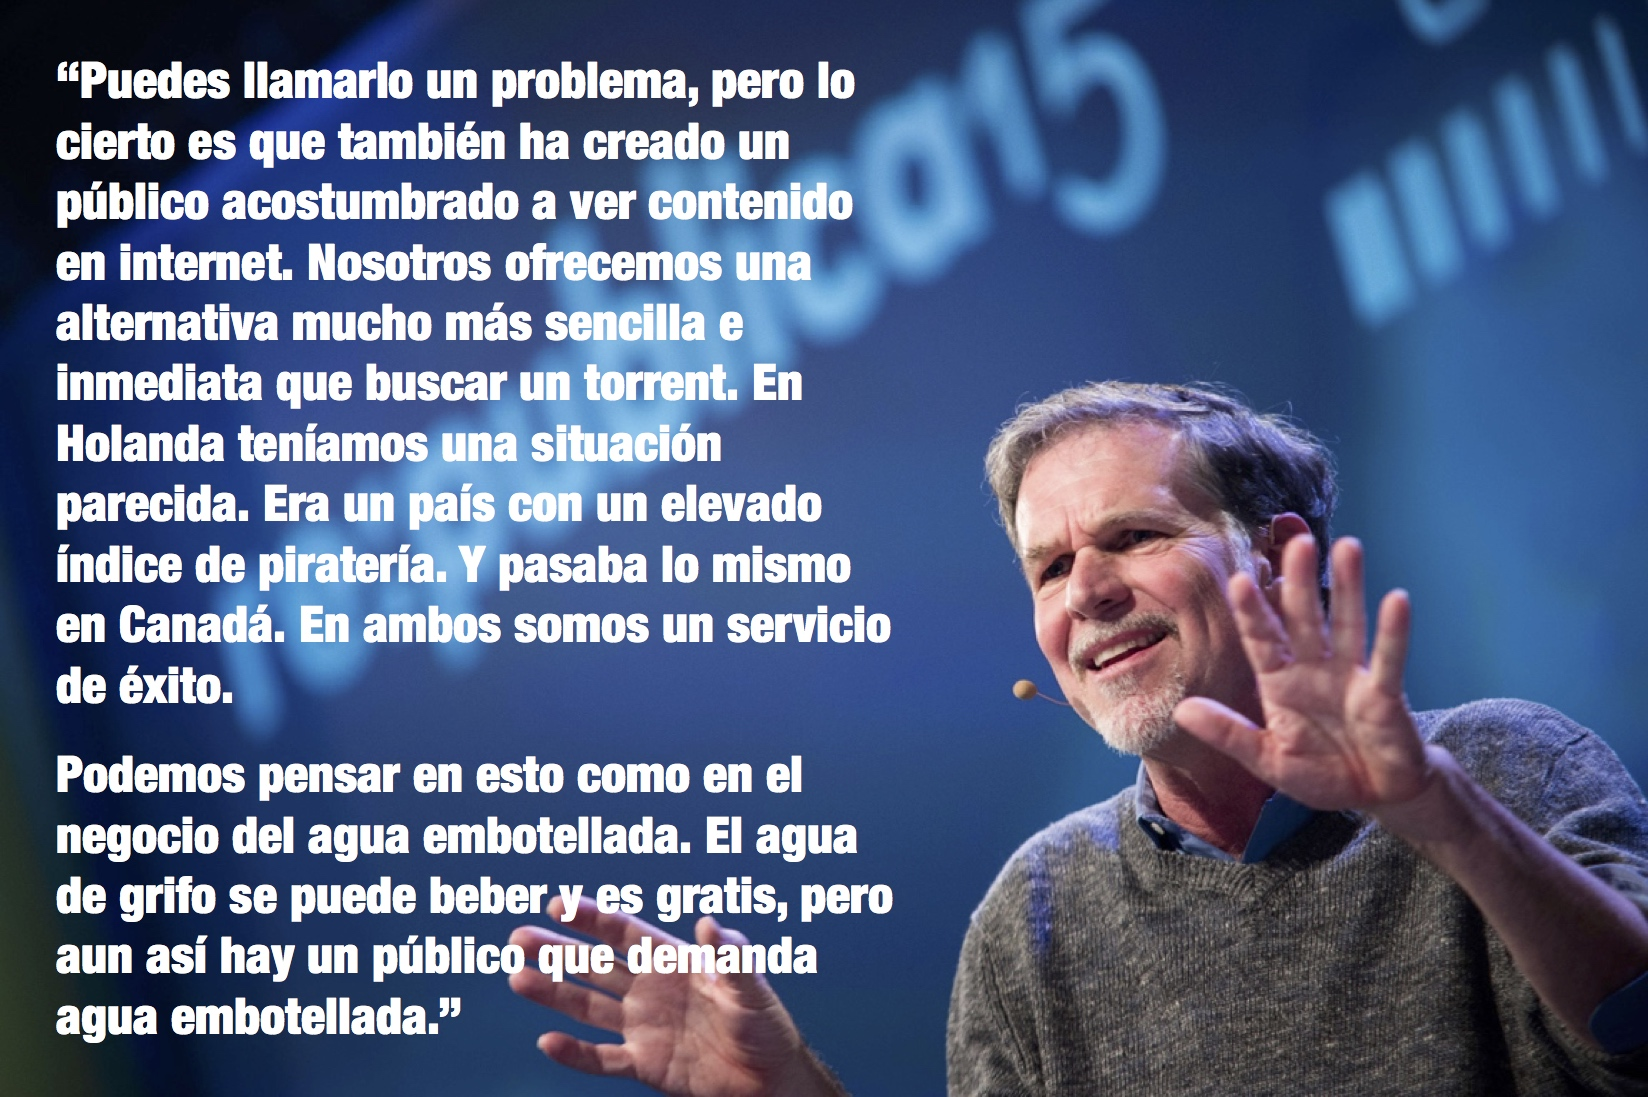 Reed Hastings on piracy (IMAGE: Gregor Fischer, TEXT: El Mundo)